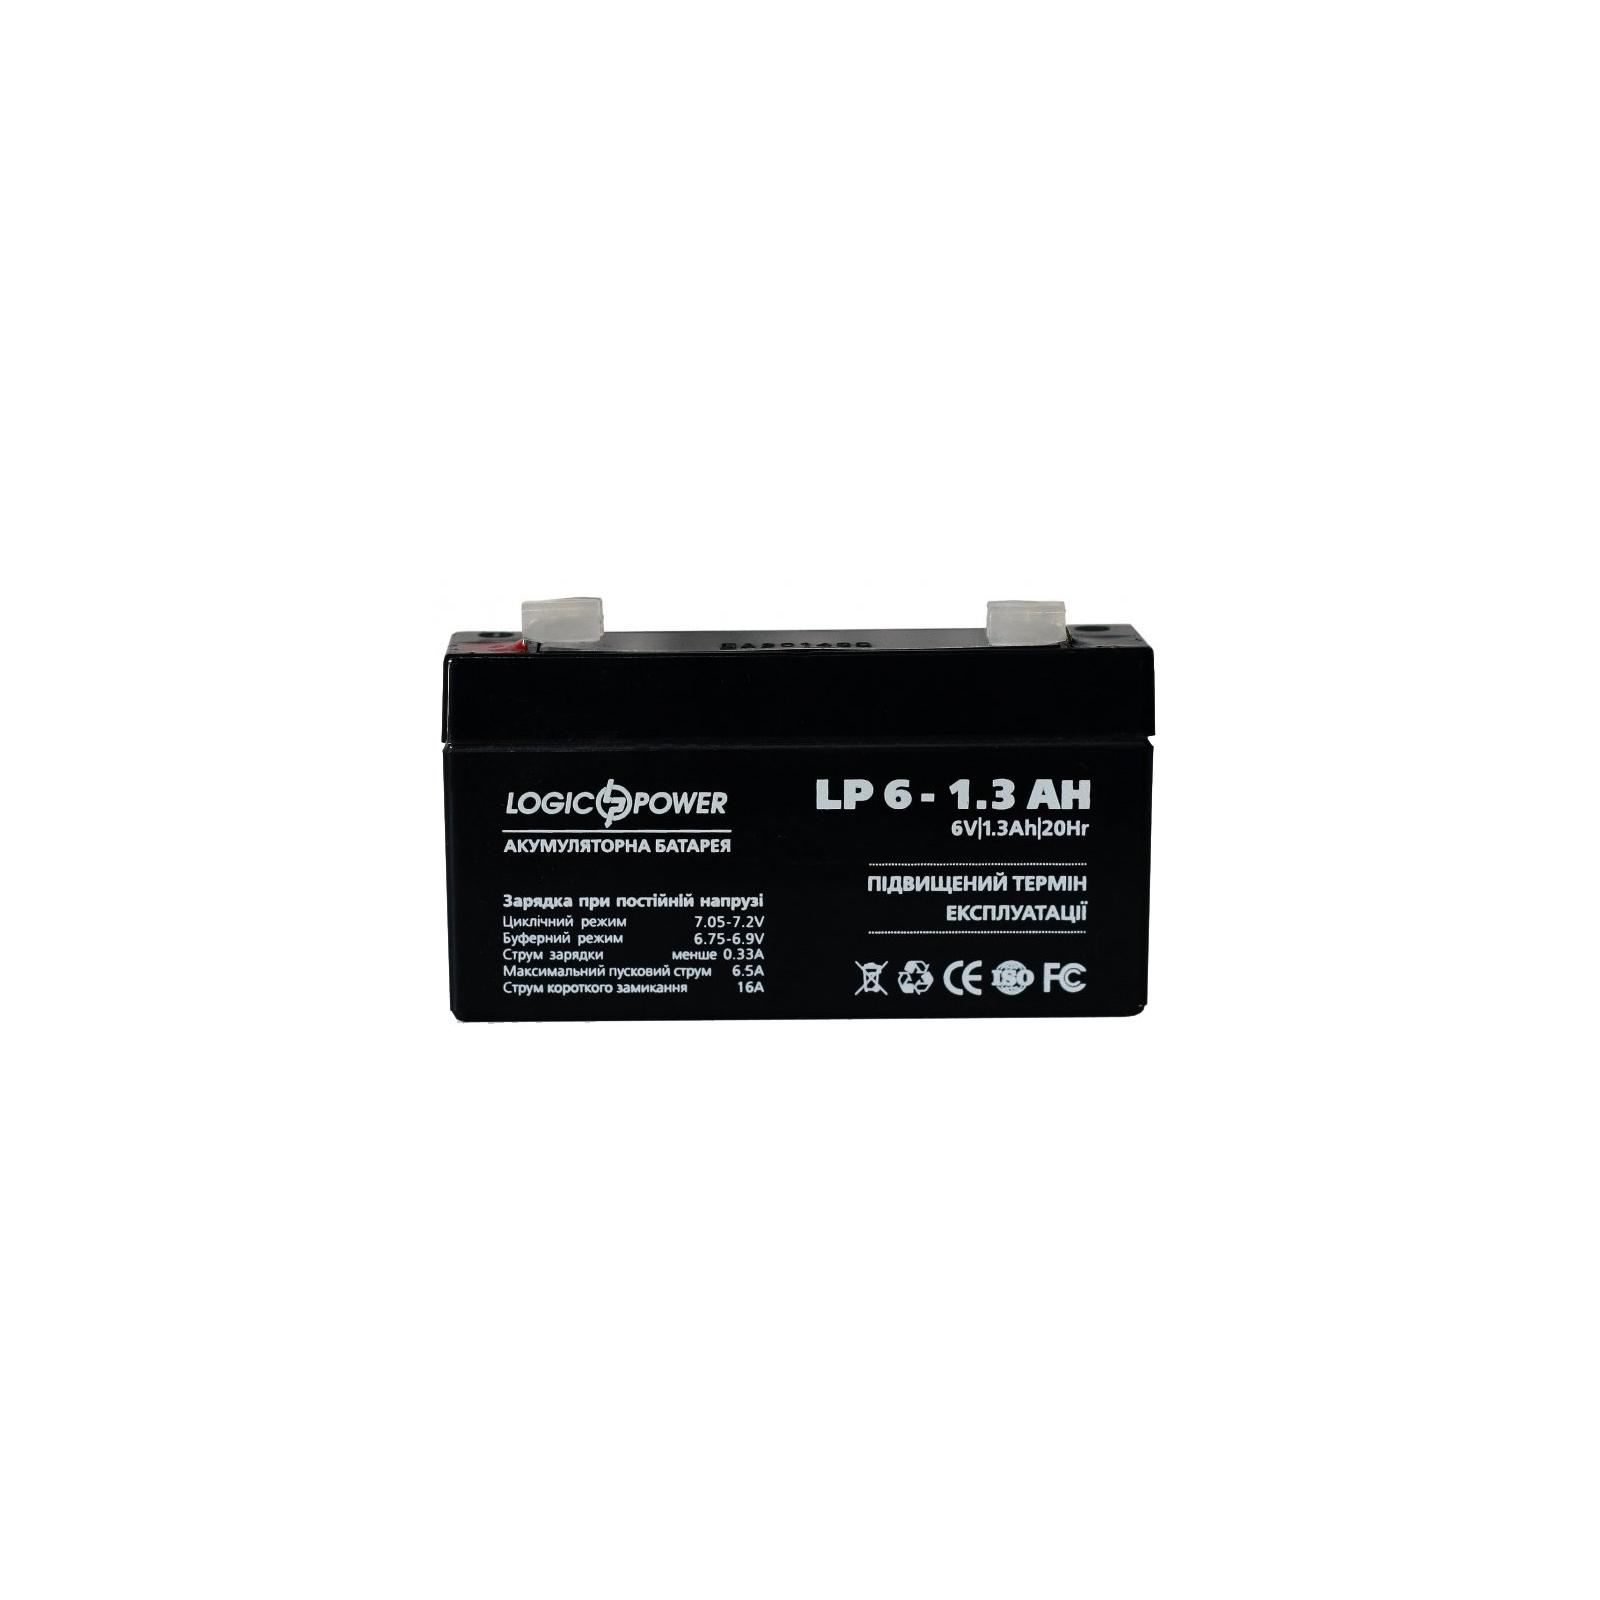 Батарея к ИБП LogicPower 6В 1.3 Ач (2673)